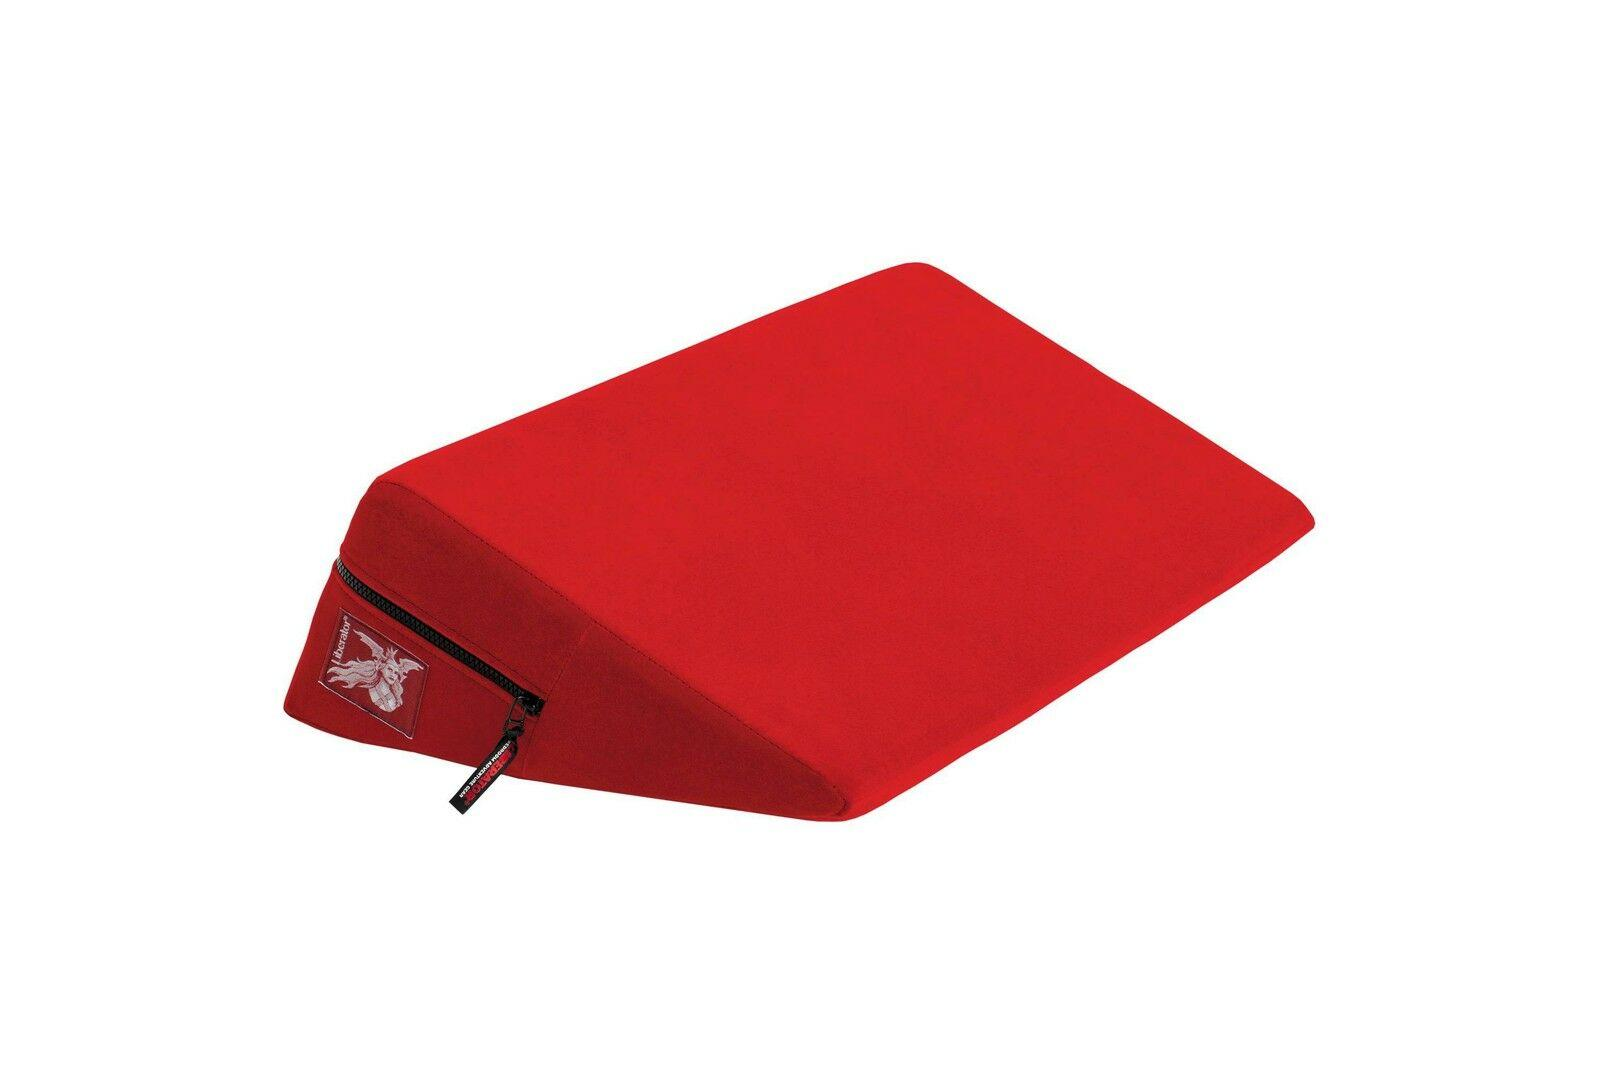 Liberator Wedge íntimo Posicionamiento Almohada - Red de microfibra